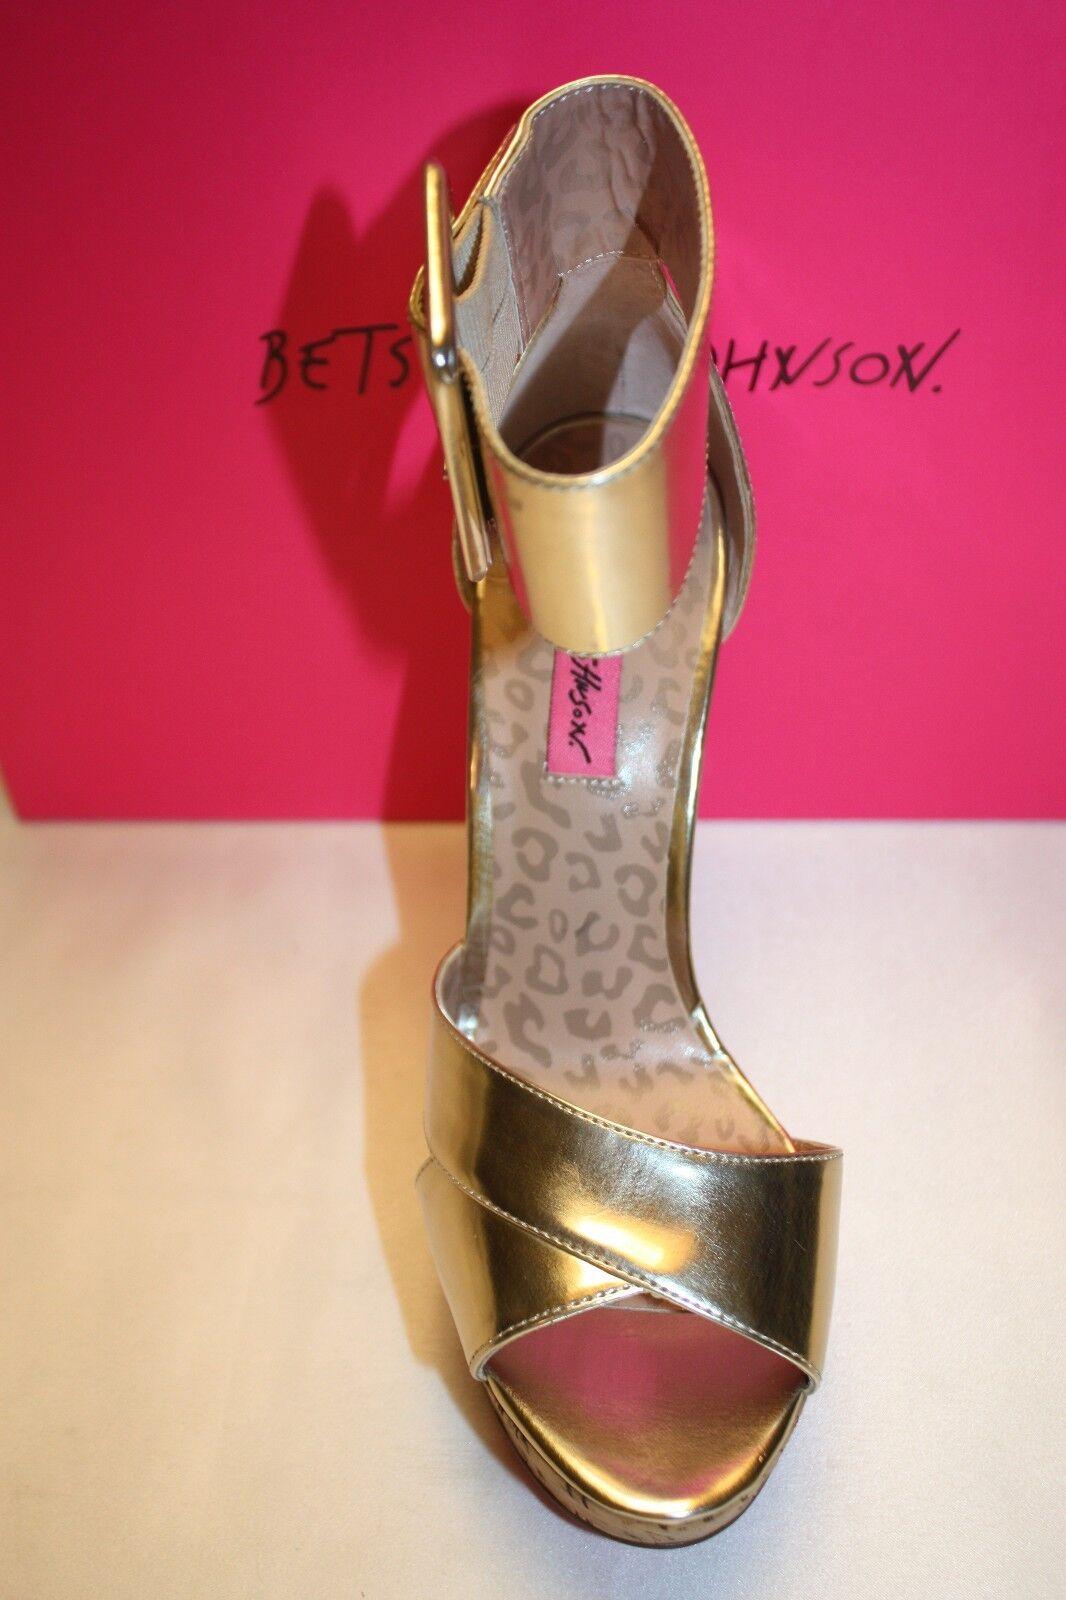 NEW NIB Curved BETSEY JOHNSON Metallic Gold Patent MORGANN Curved NIB Spike Heel Wedge 110 f78d0d